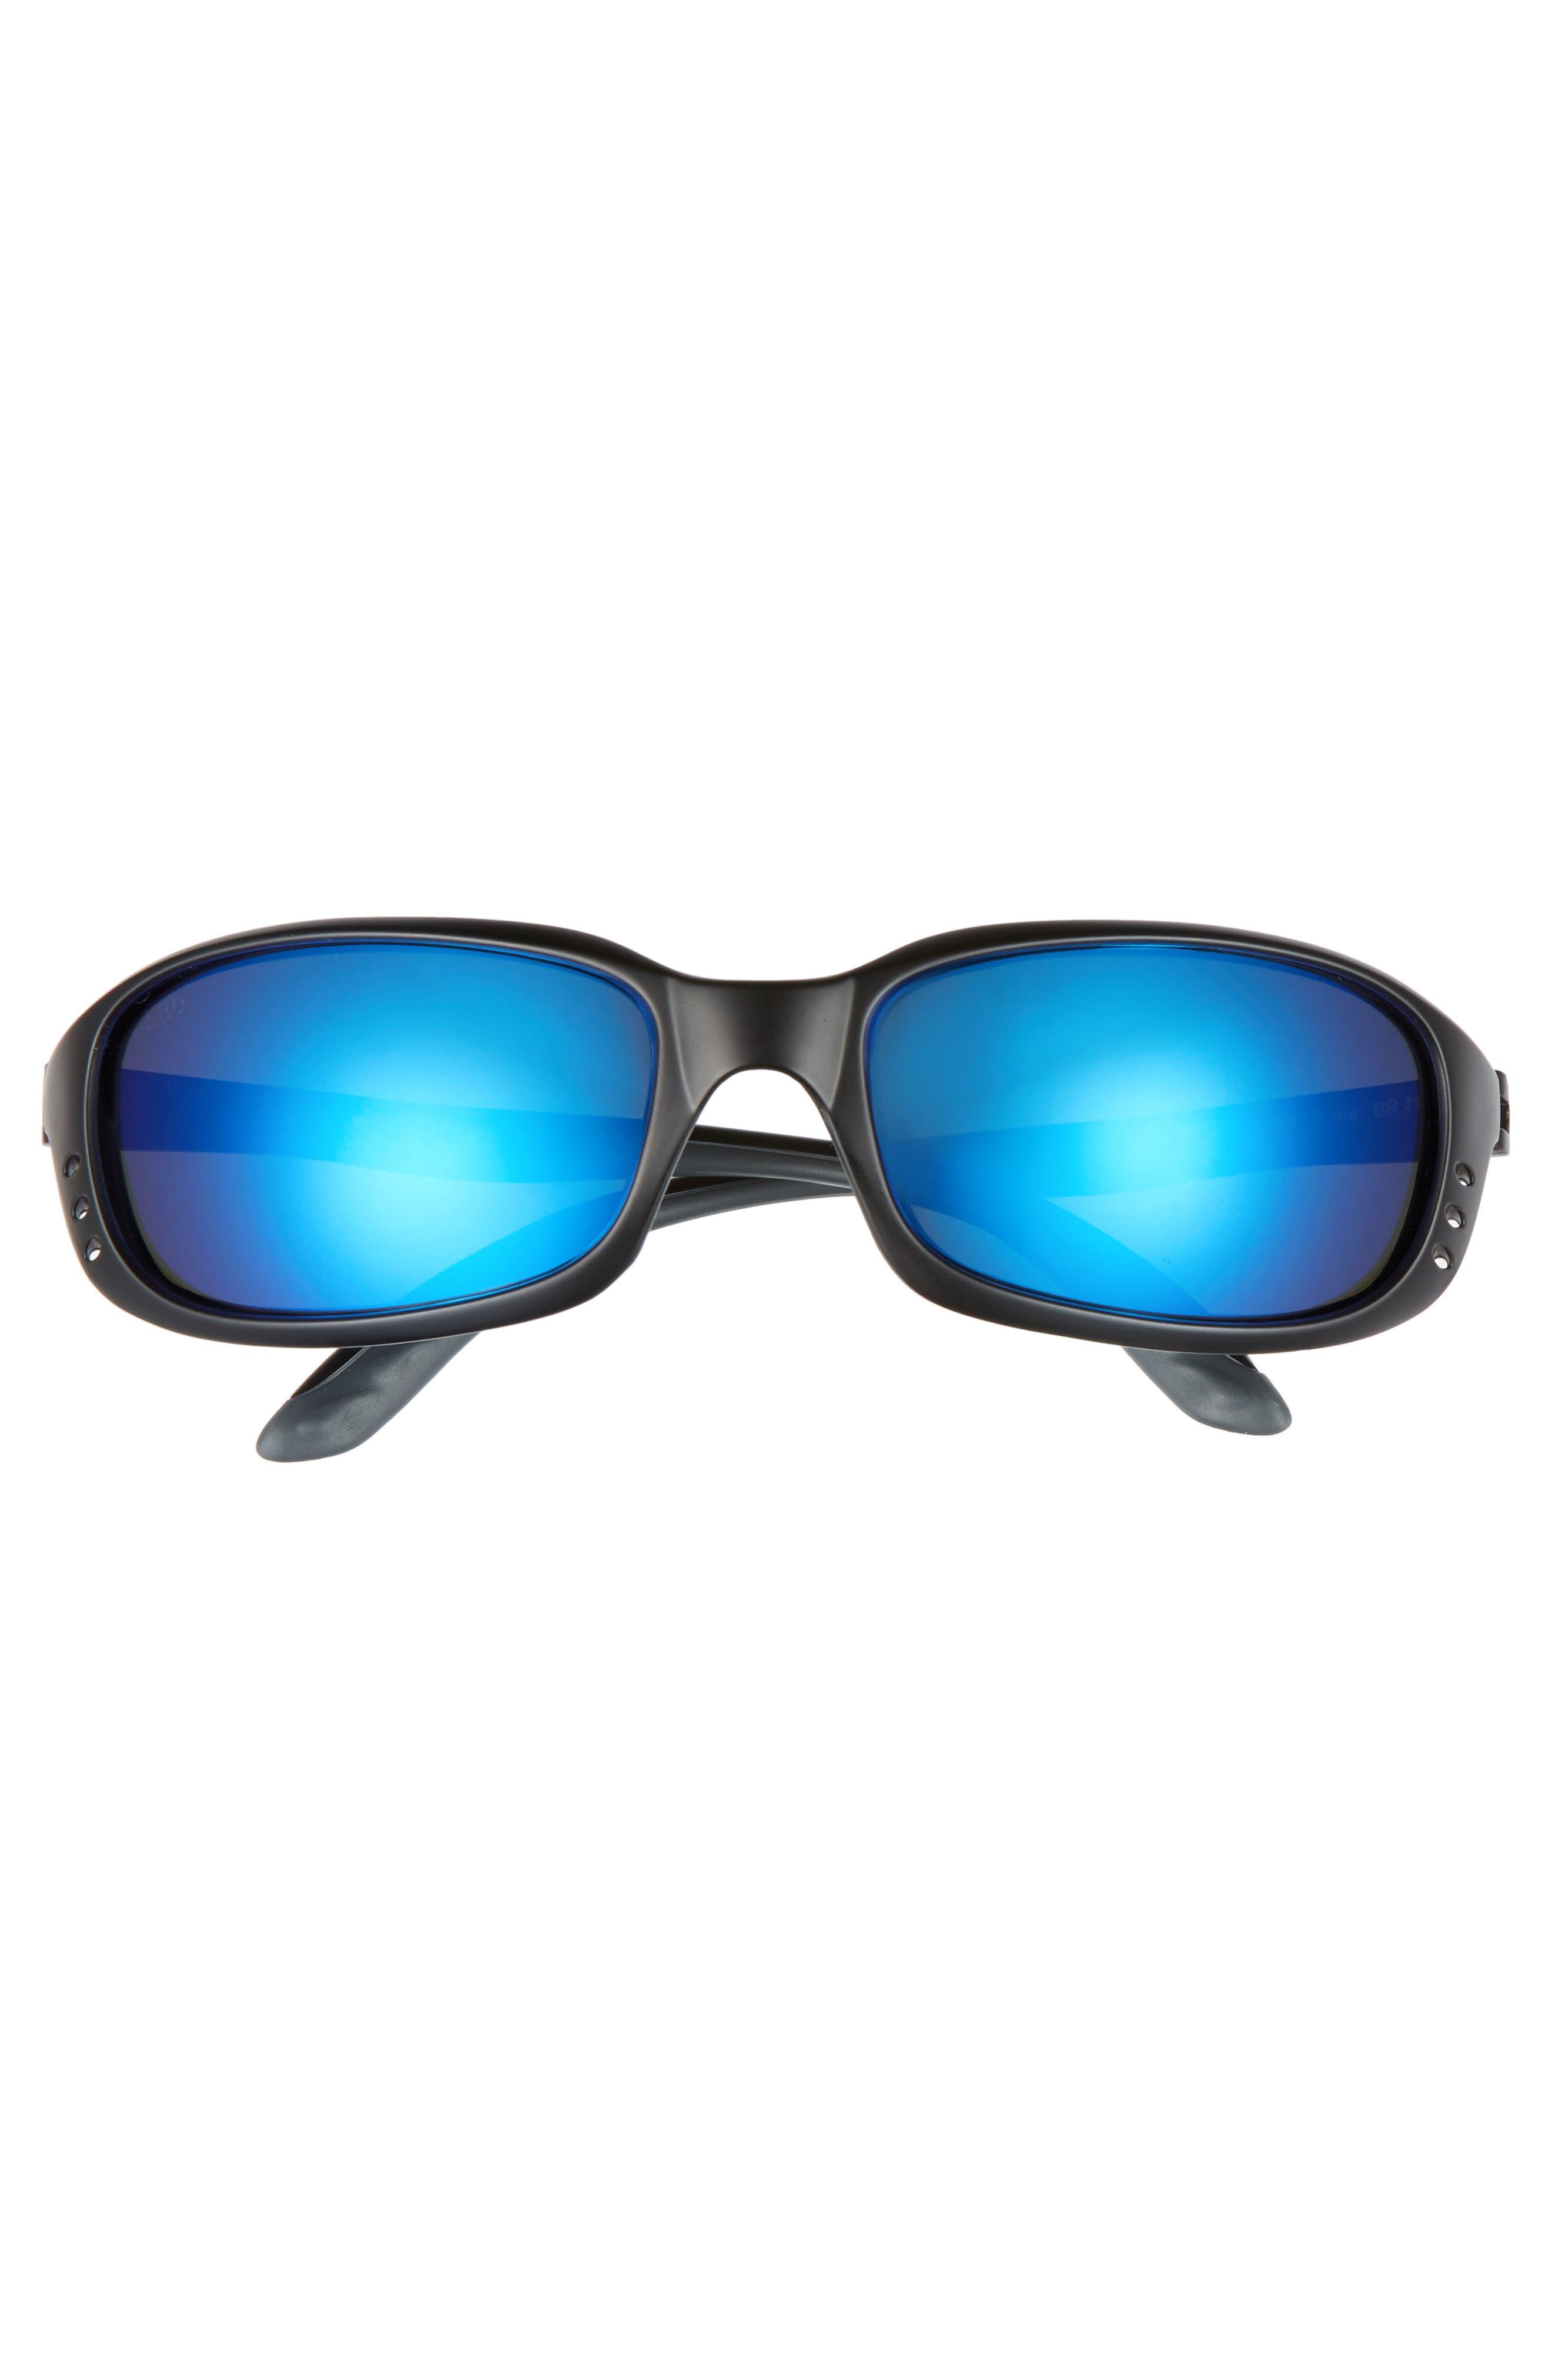 Brine 60mm Polarized Sunglasses,                             Alternate thumbnail 2, color,                             BLACK/ BLUE MIRROR